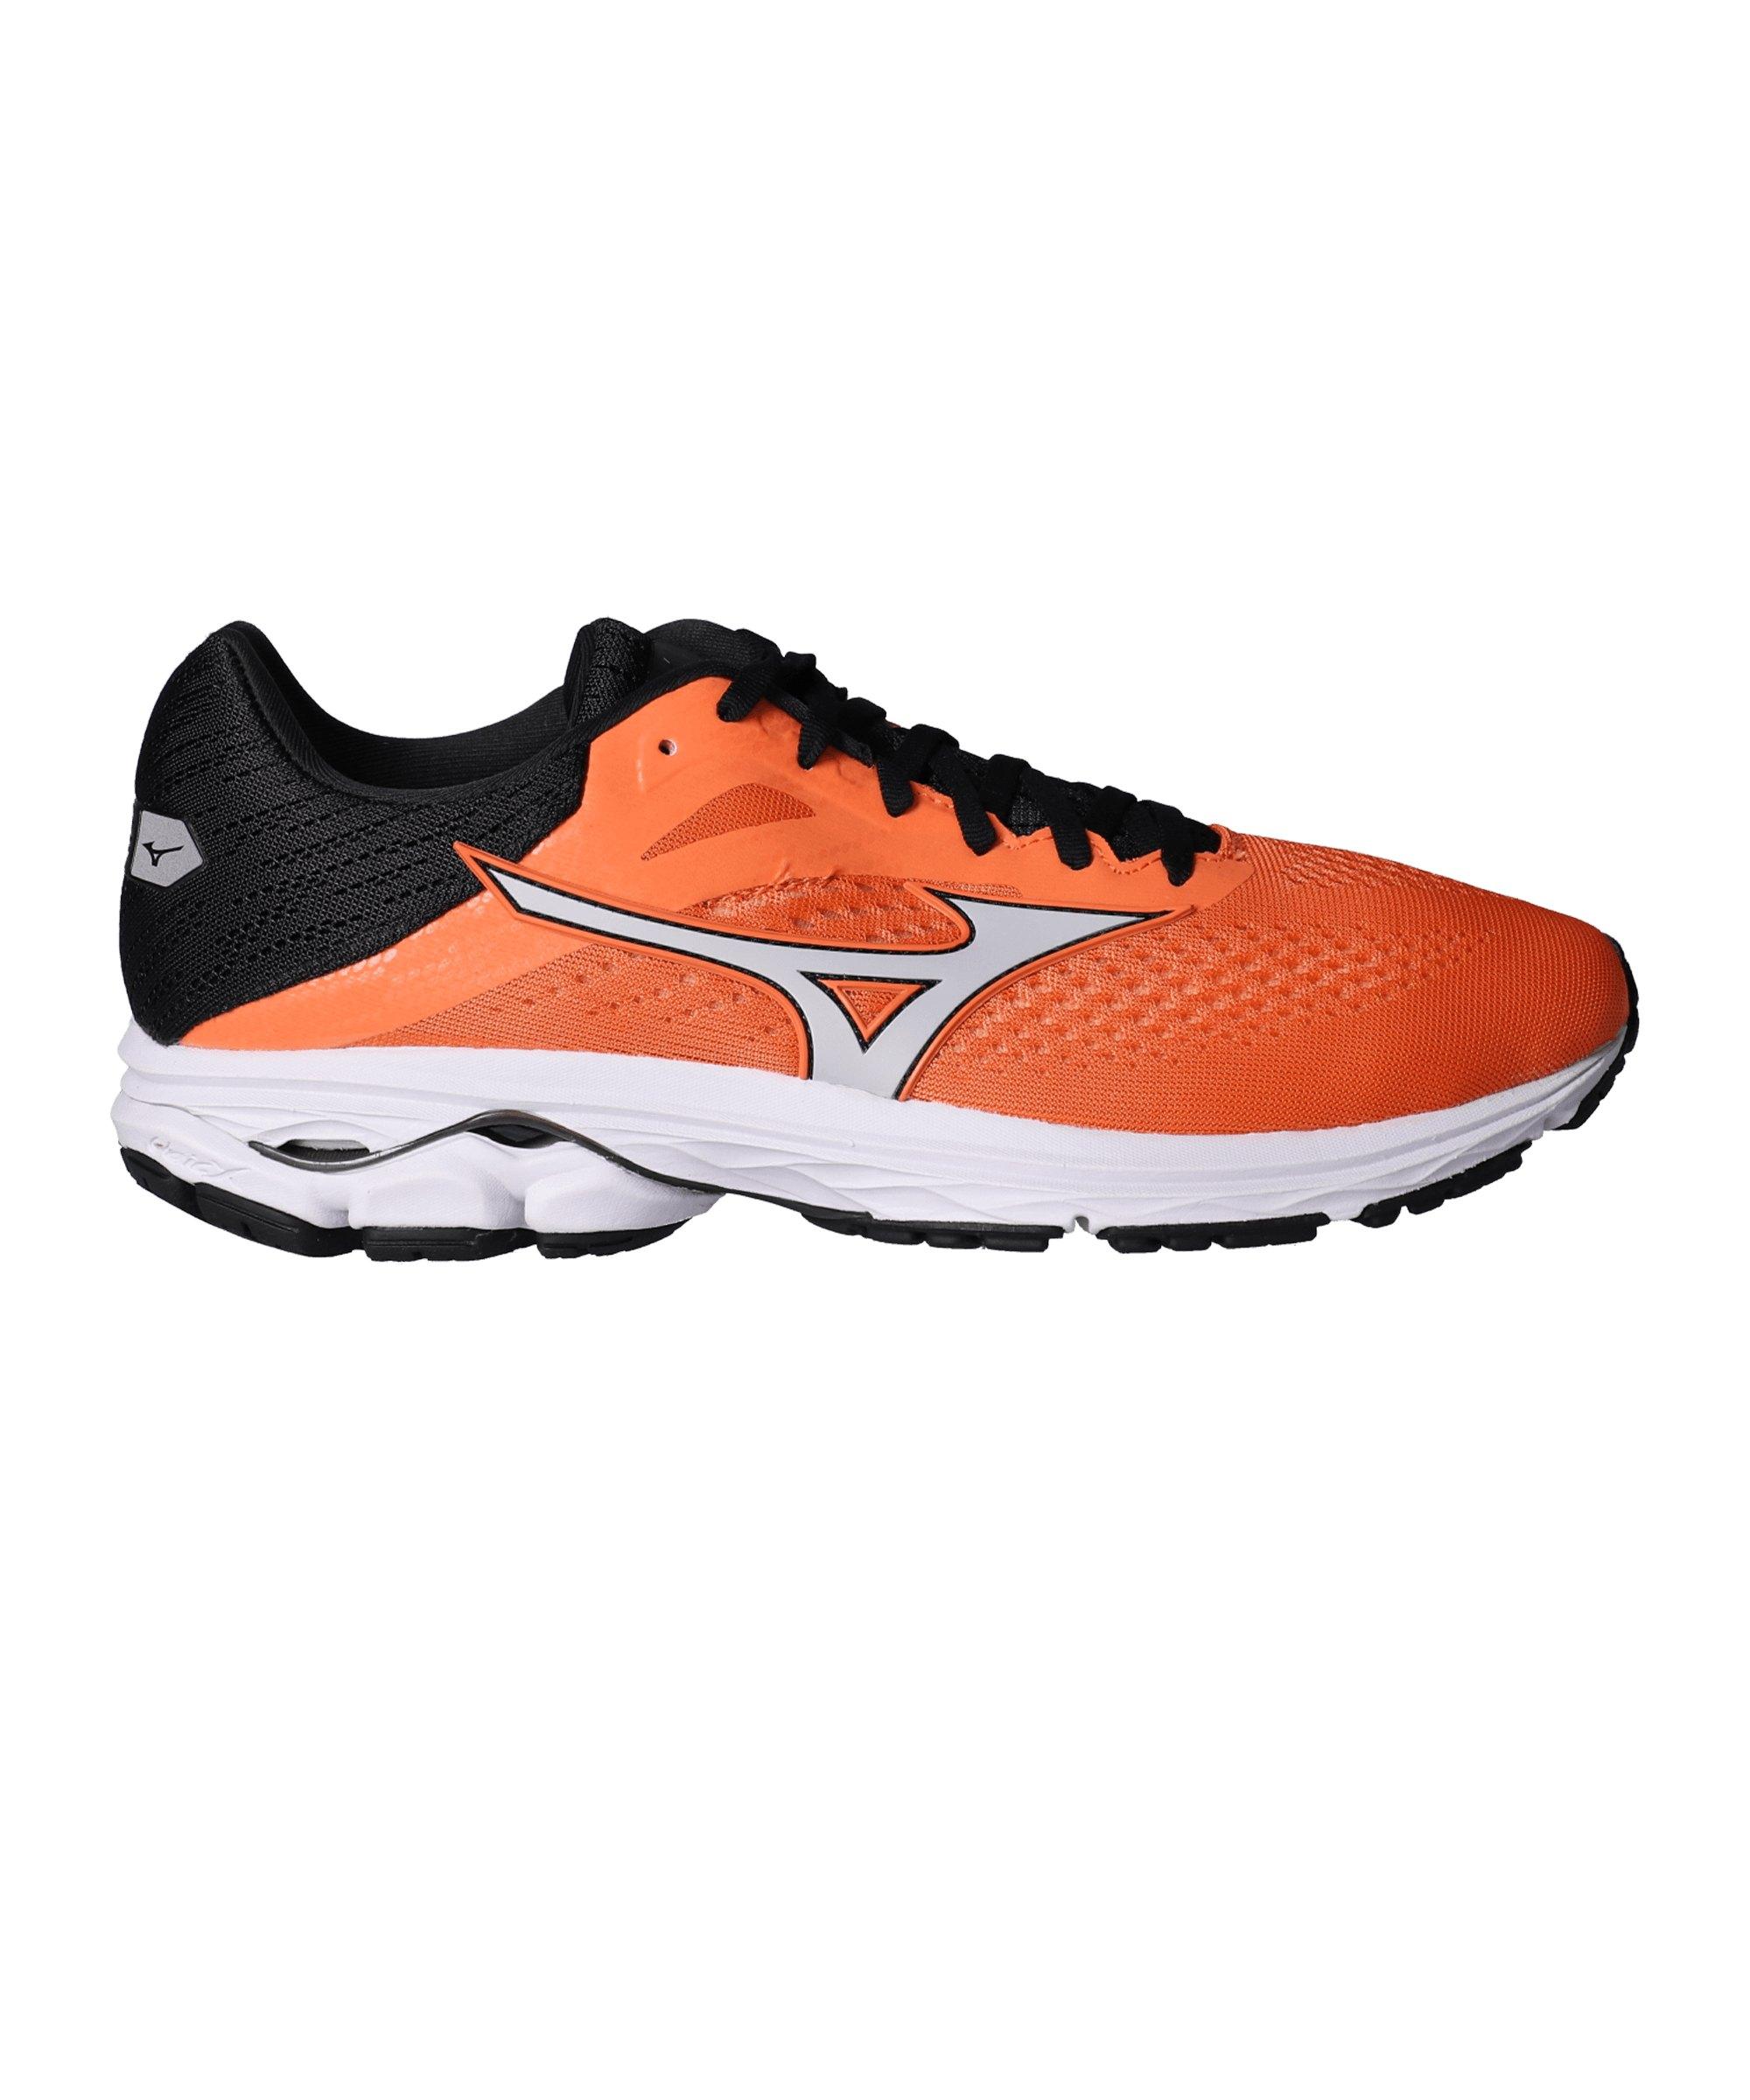 Mizuno Wave Rider 23 Running Orange - orange